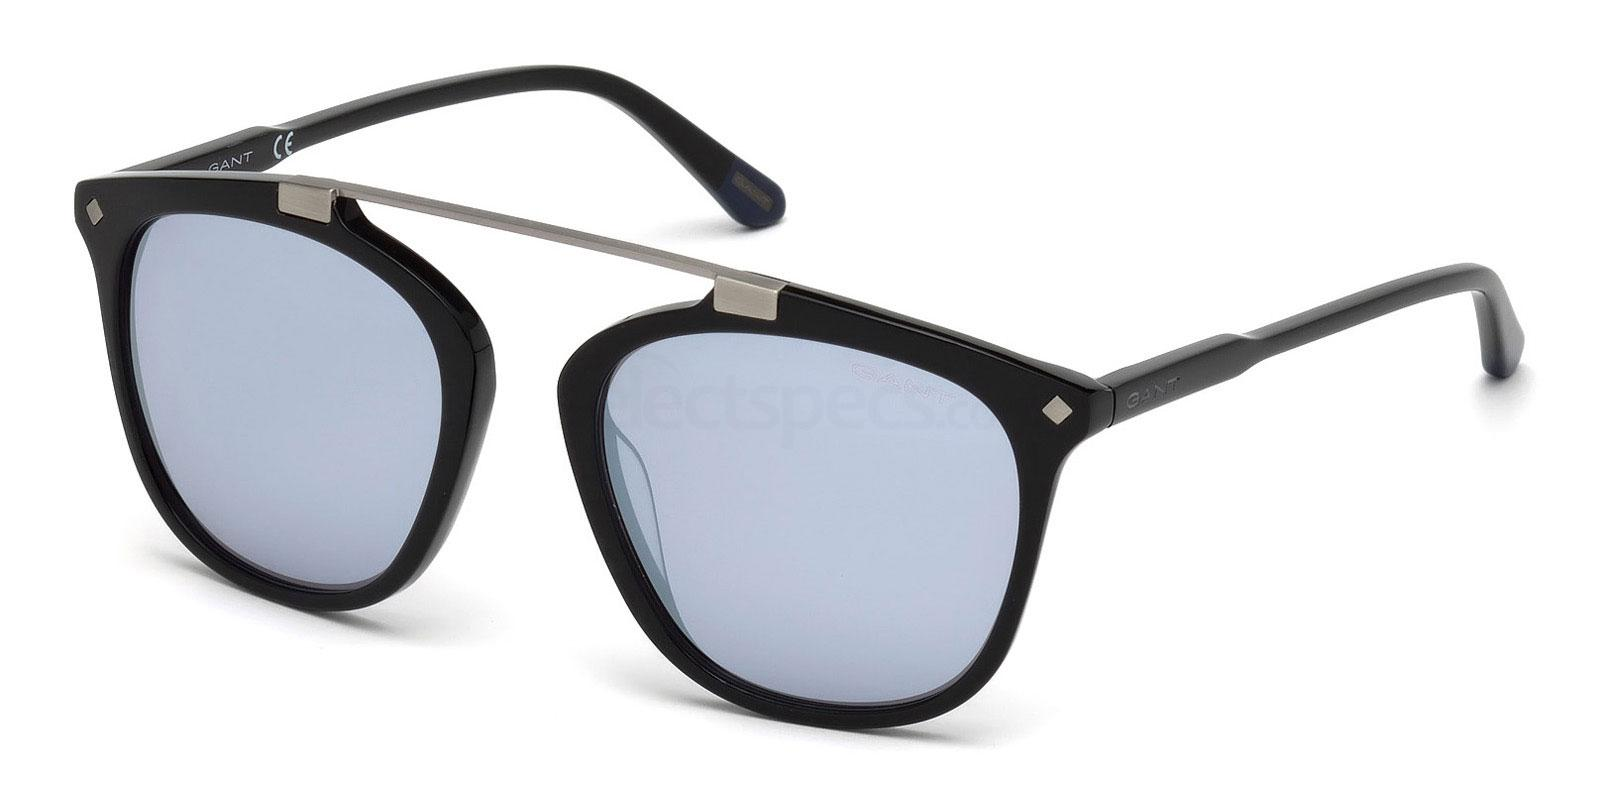 GANT sunglasses men